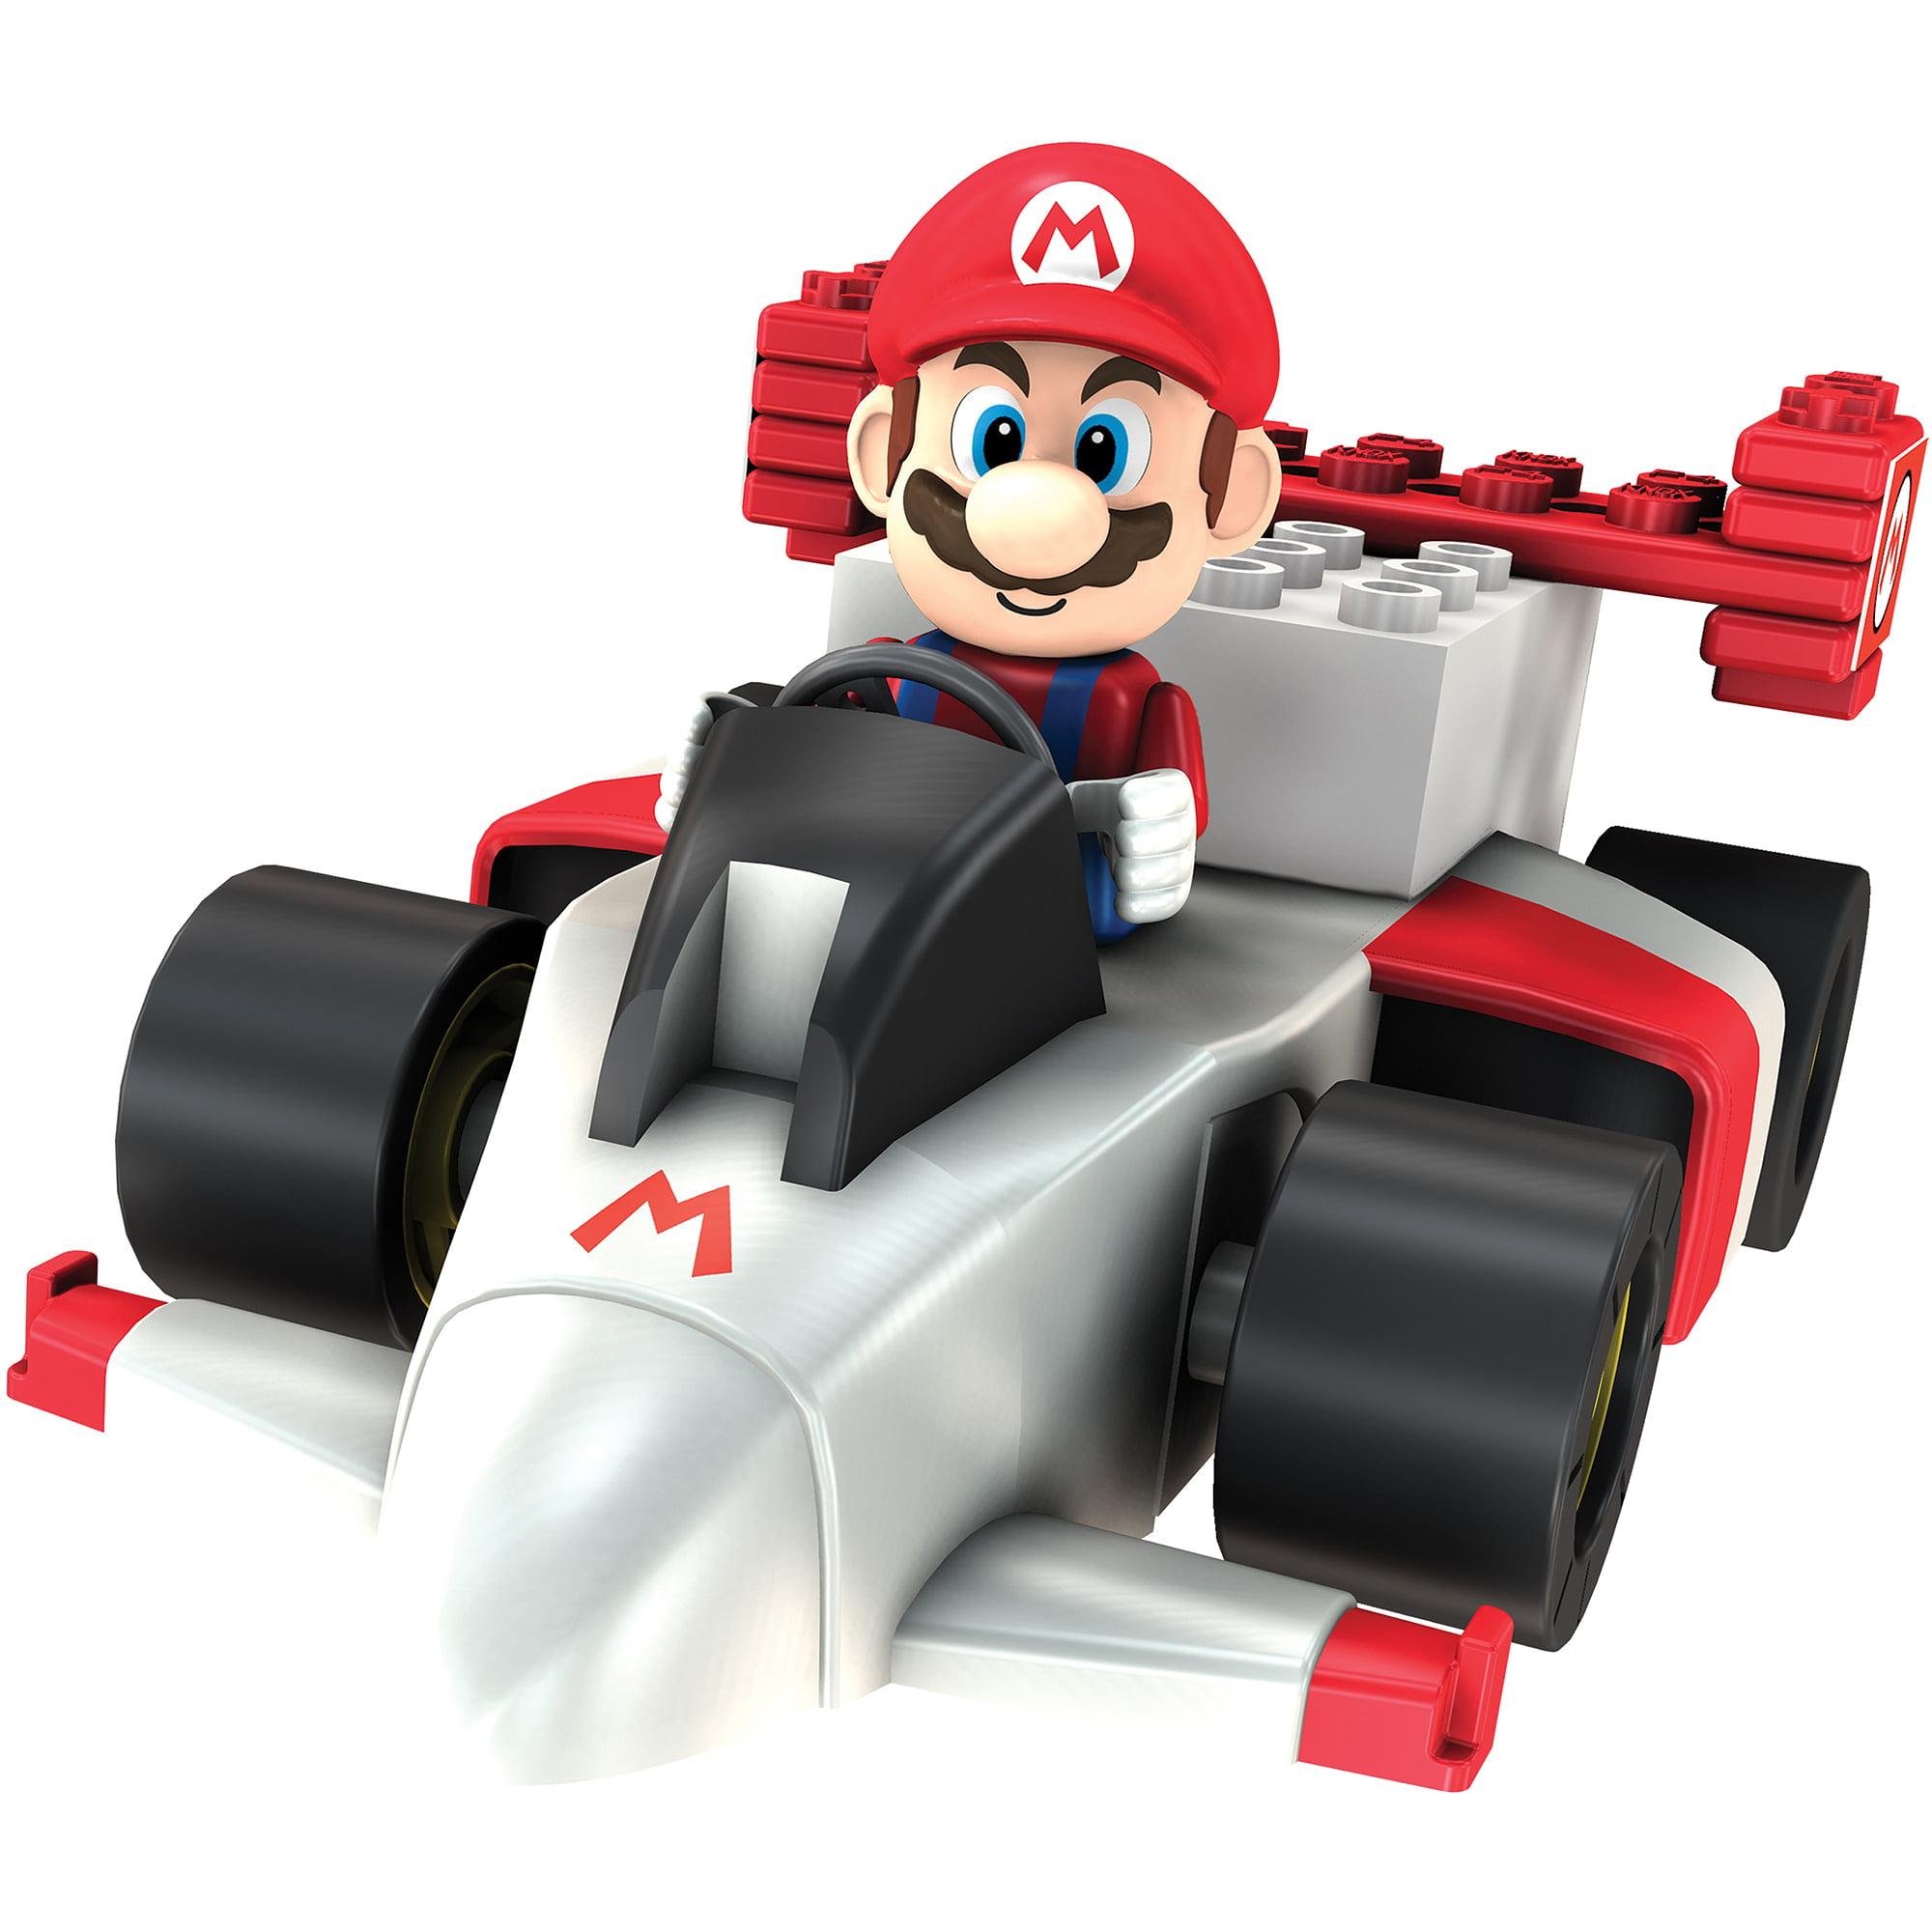 K'NEX Mario Kart Wii Building Set: Mario vs. Piranha Plant Track -  Walmart.com